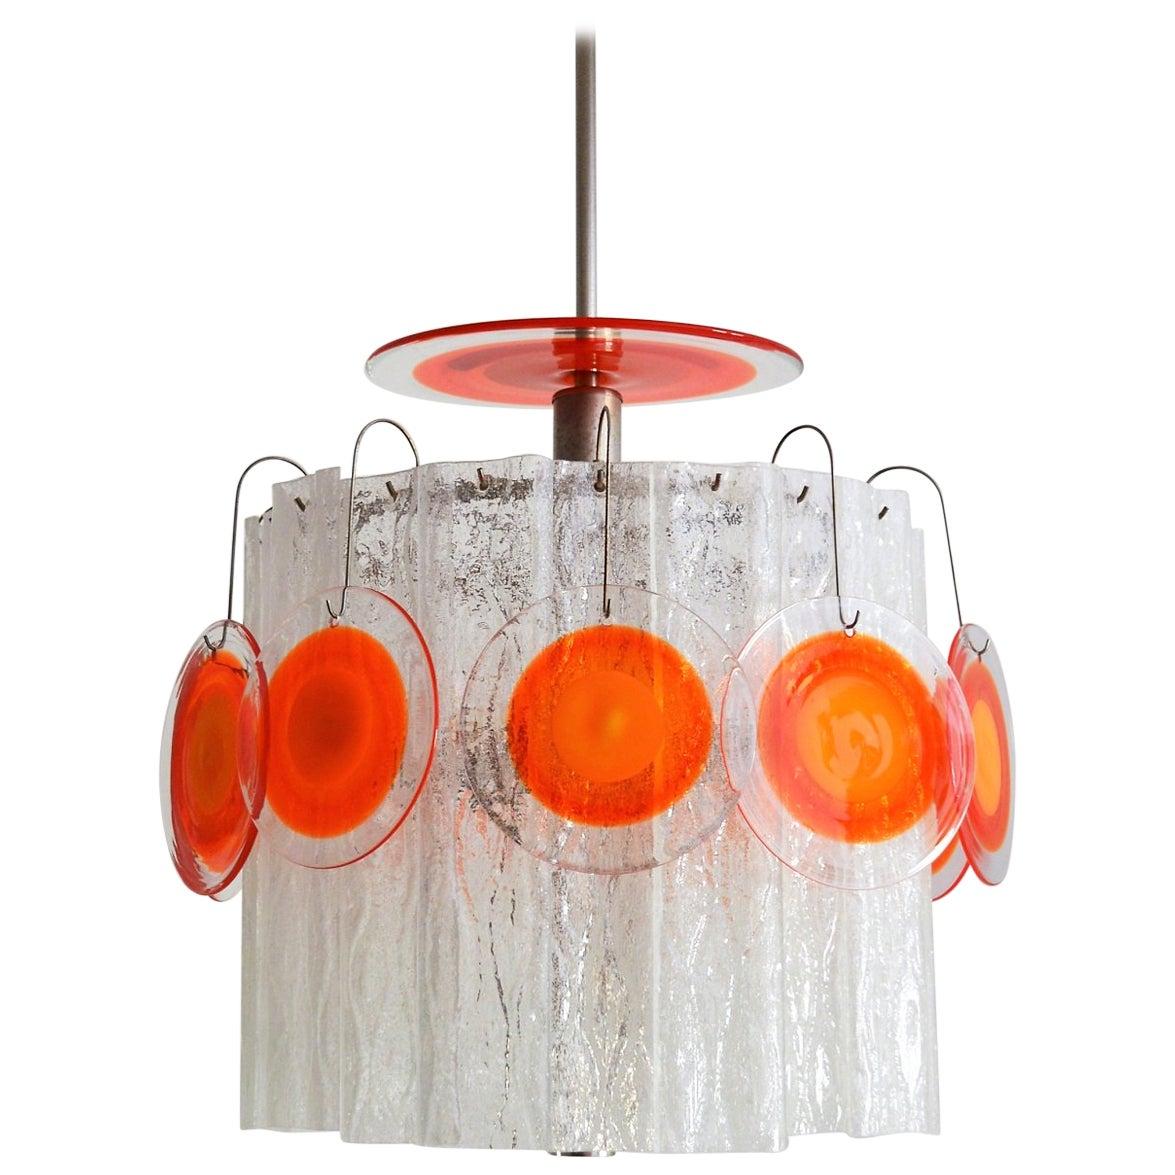 Italian Midcentury Murano Art Glass Chandelier, 1970s